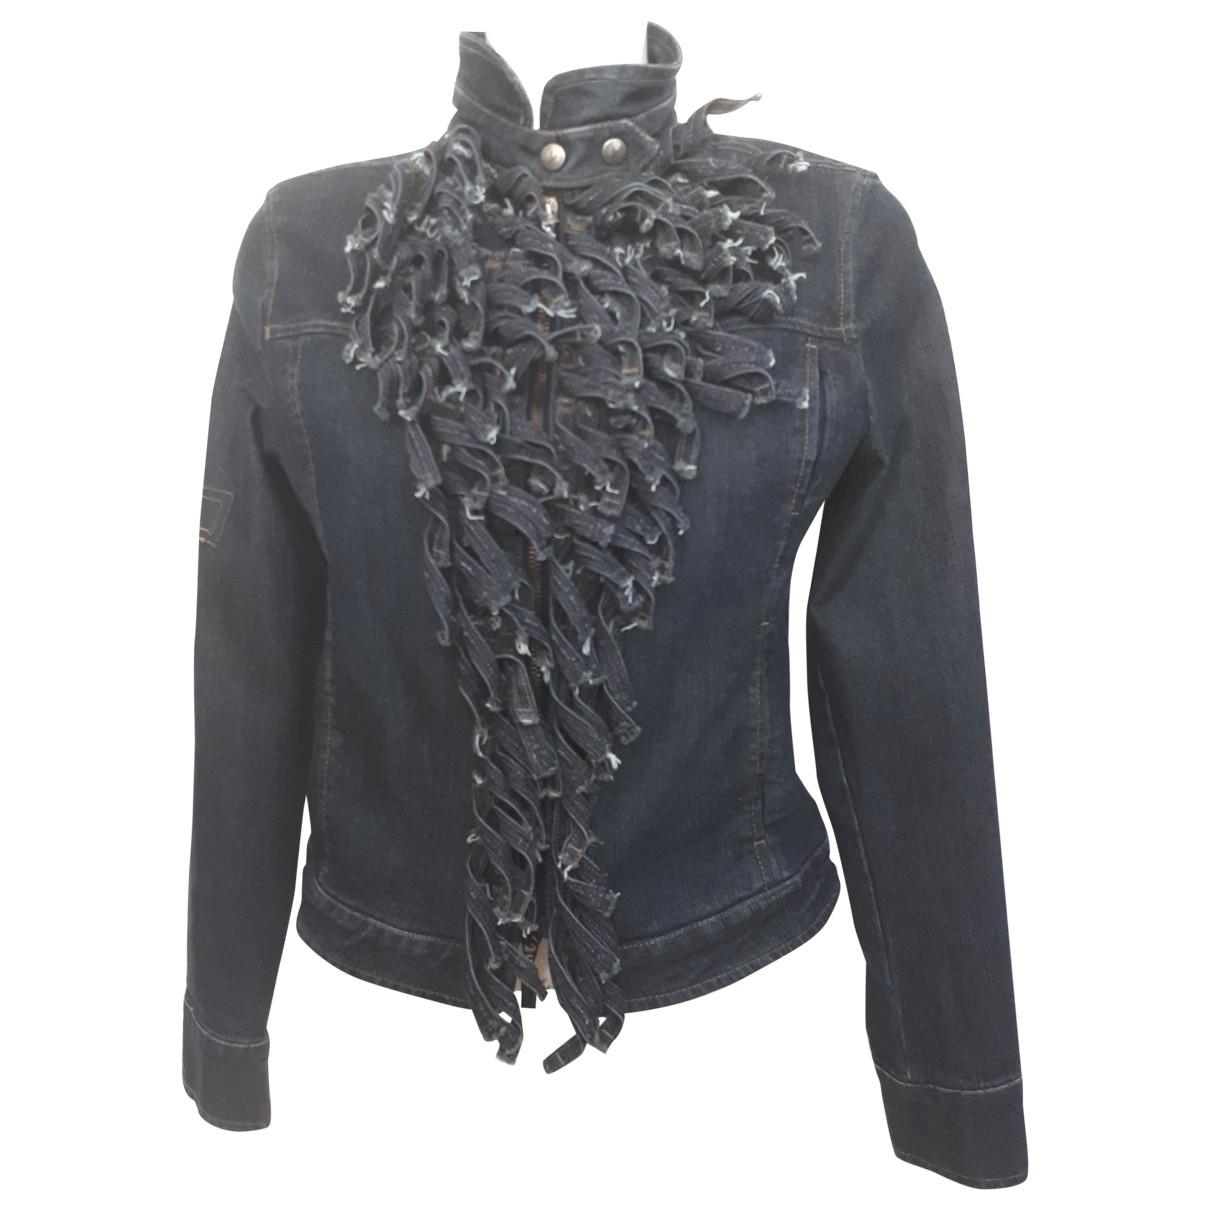 Armani Jeans \N Blue Denim - Jeans jacket for Women 10 UK